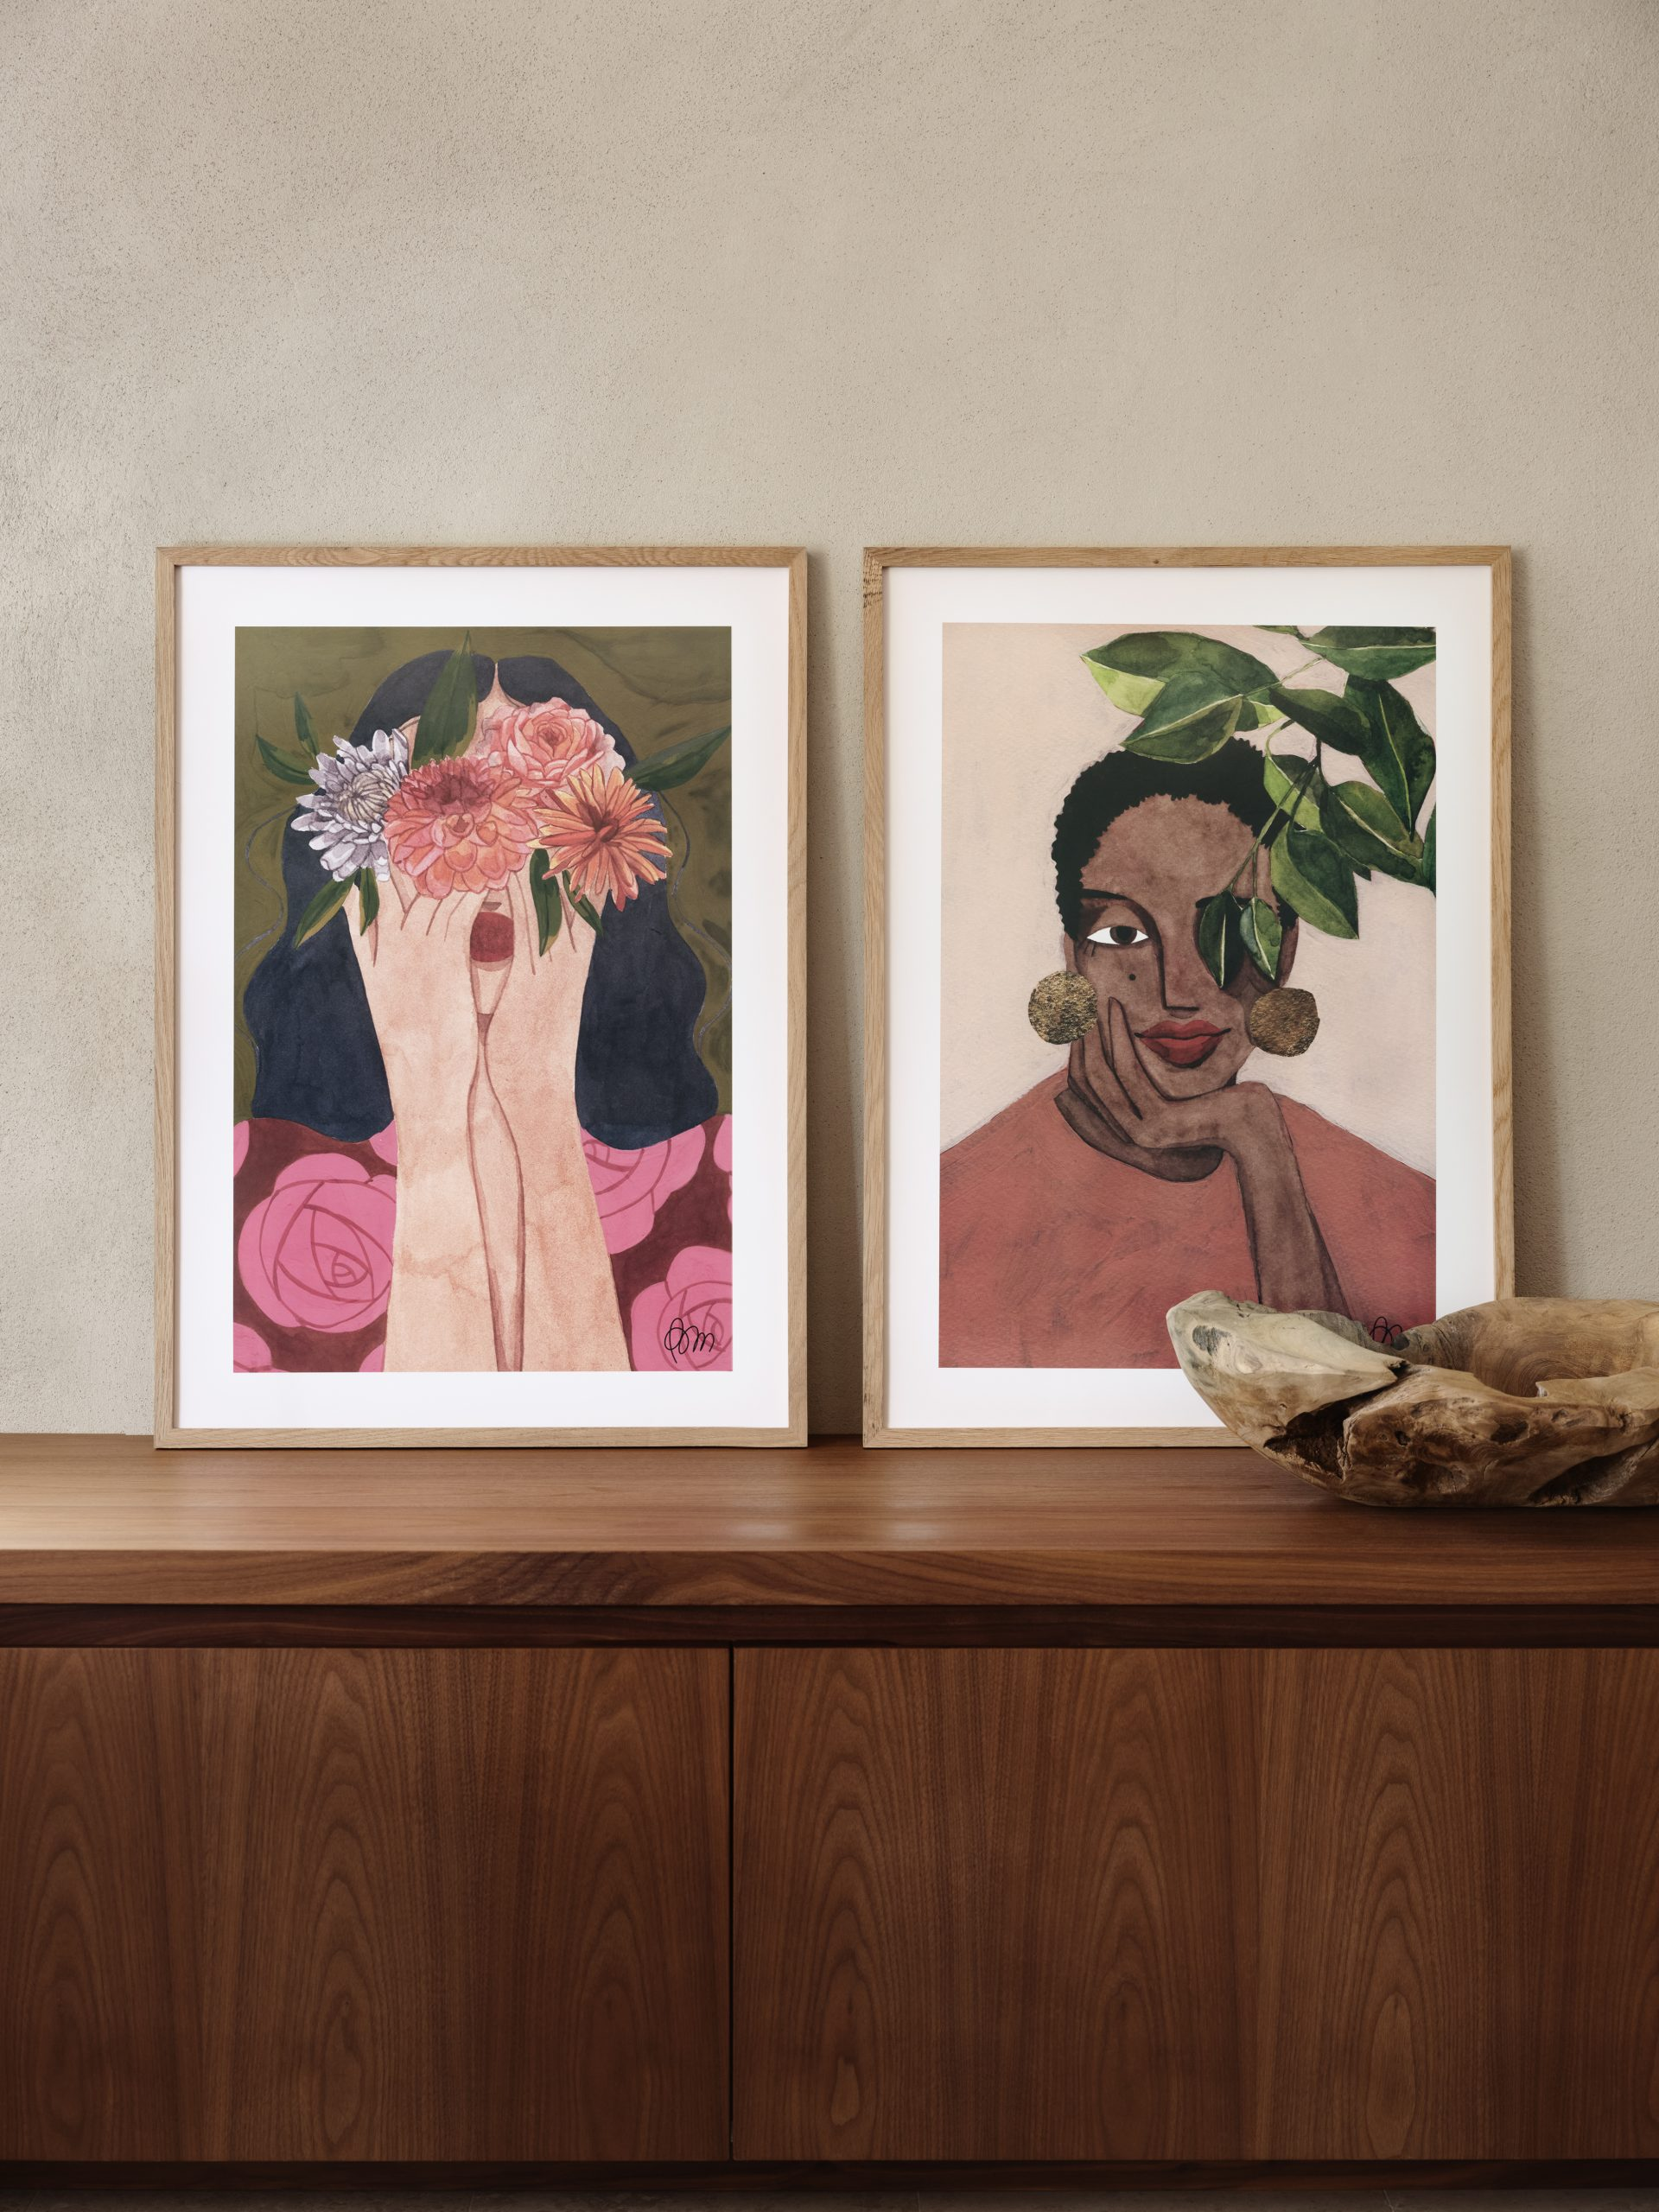 H&M Home artist collaboration